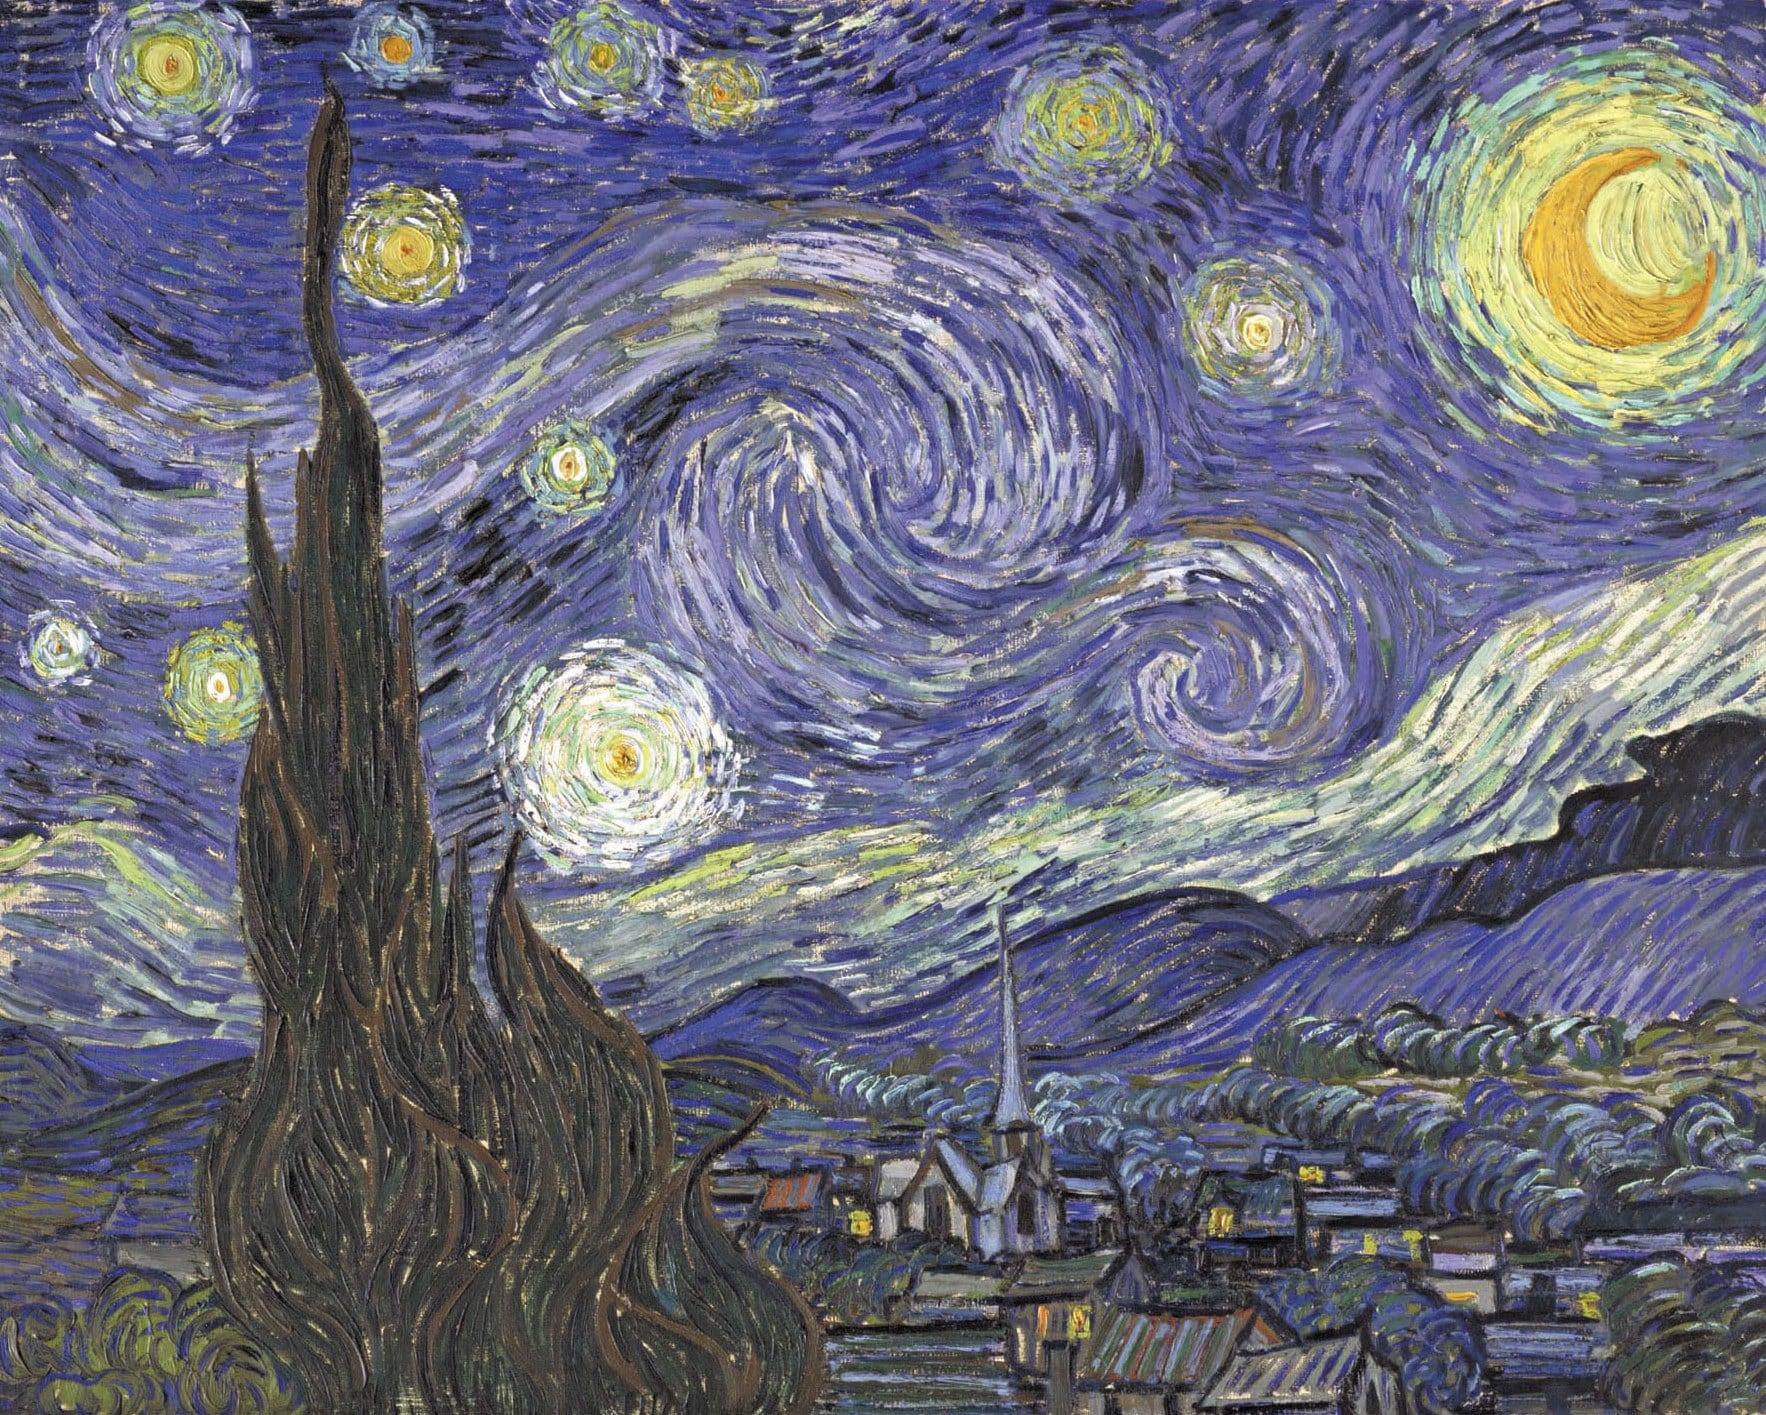 Картина Звездная ночь. Винсент Ван Гог.